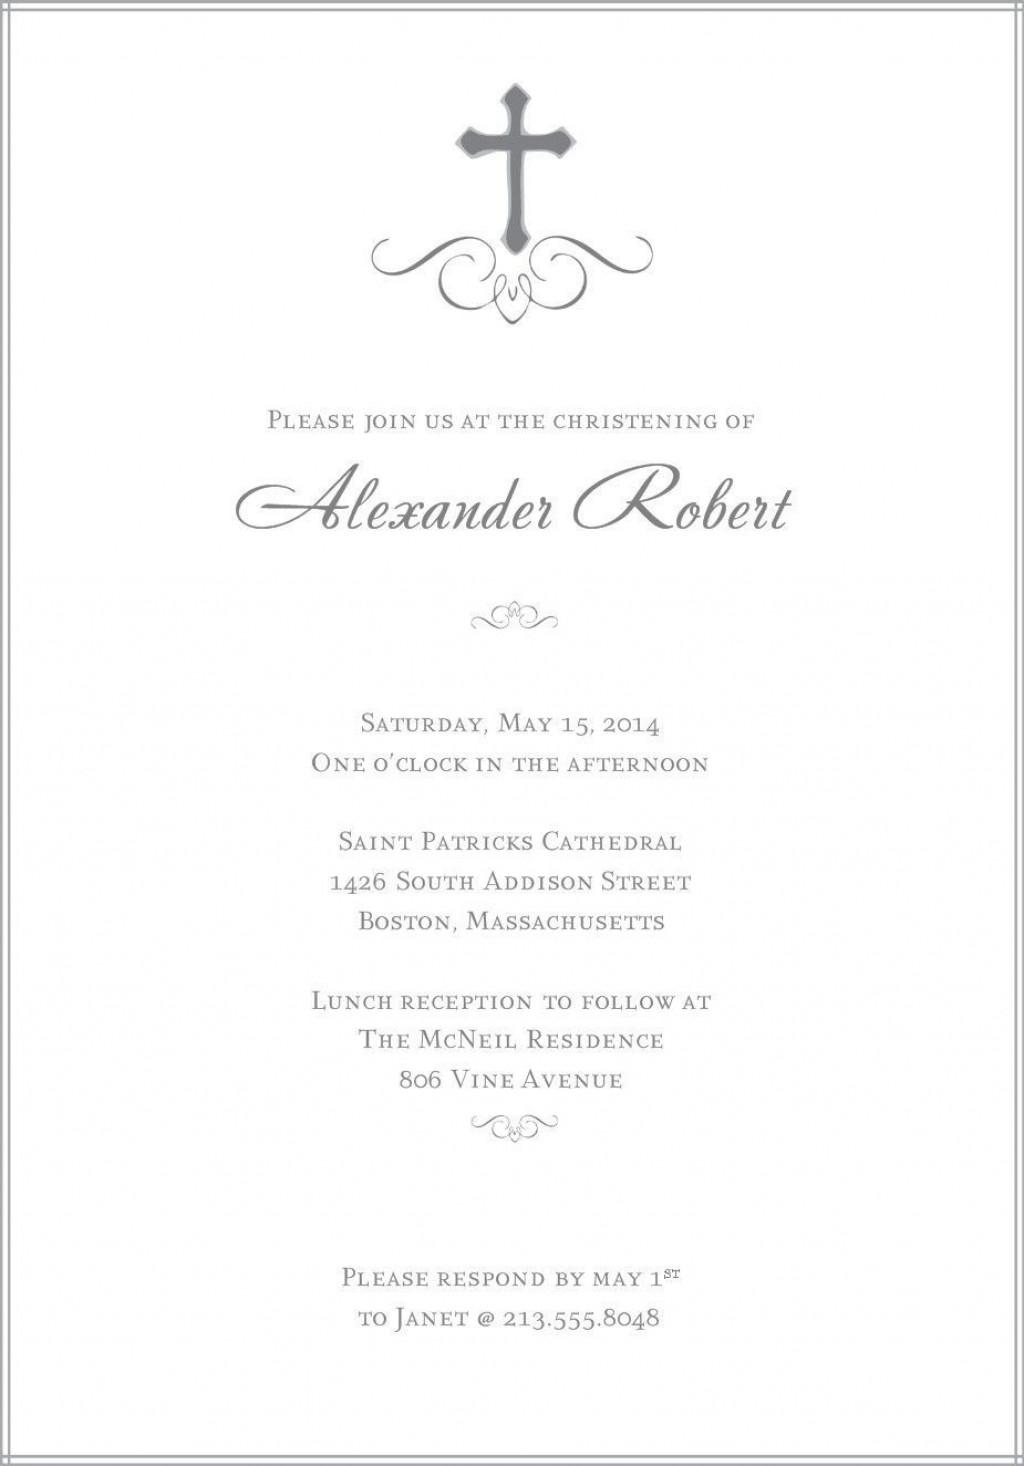 007 Imposing Free Religiou Invitation Template Printable Design Large